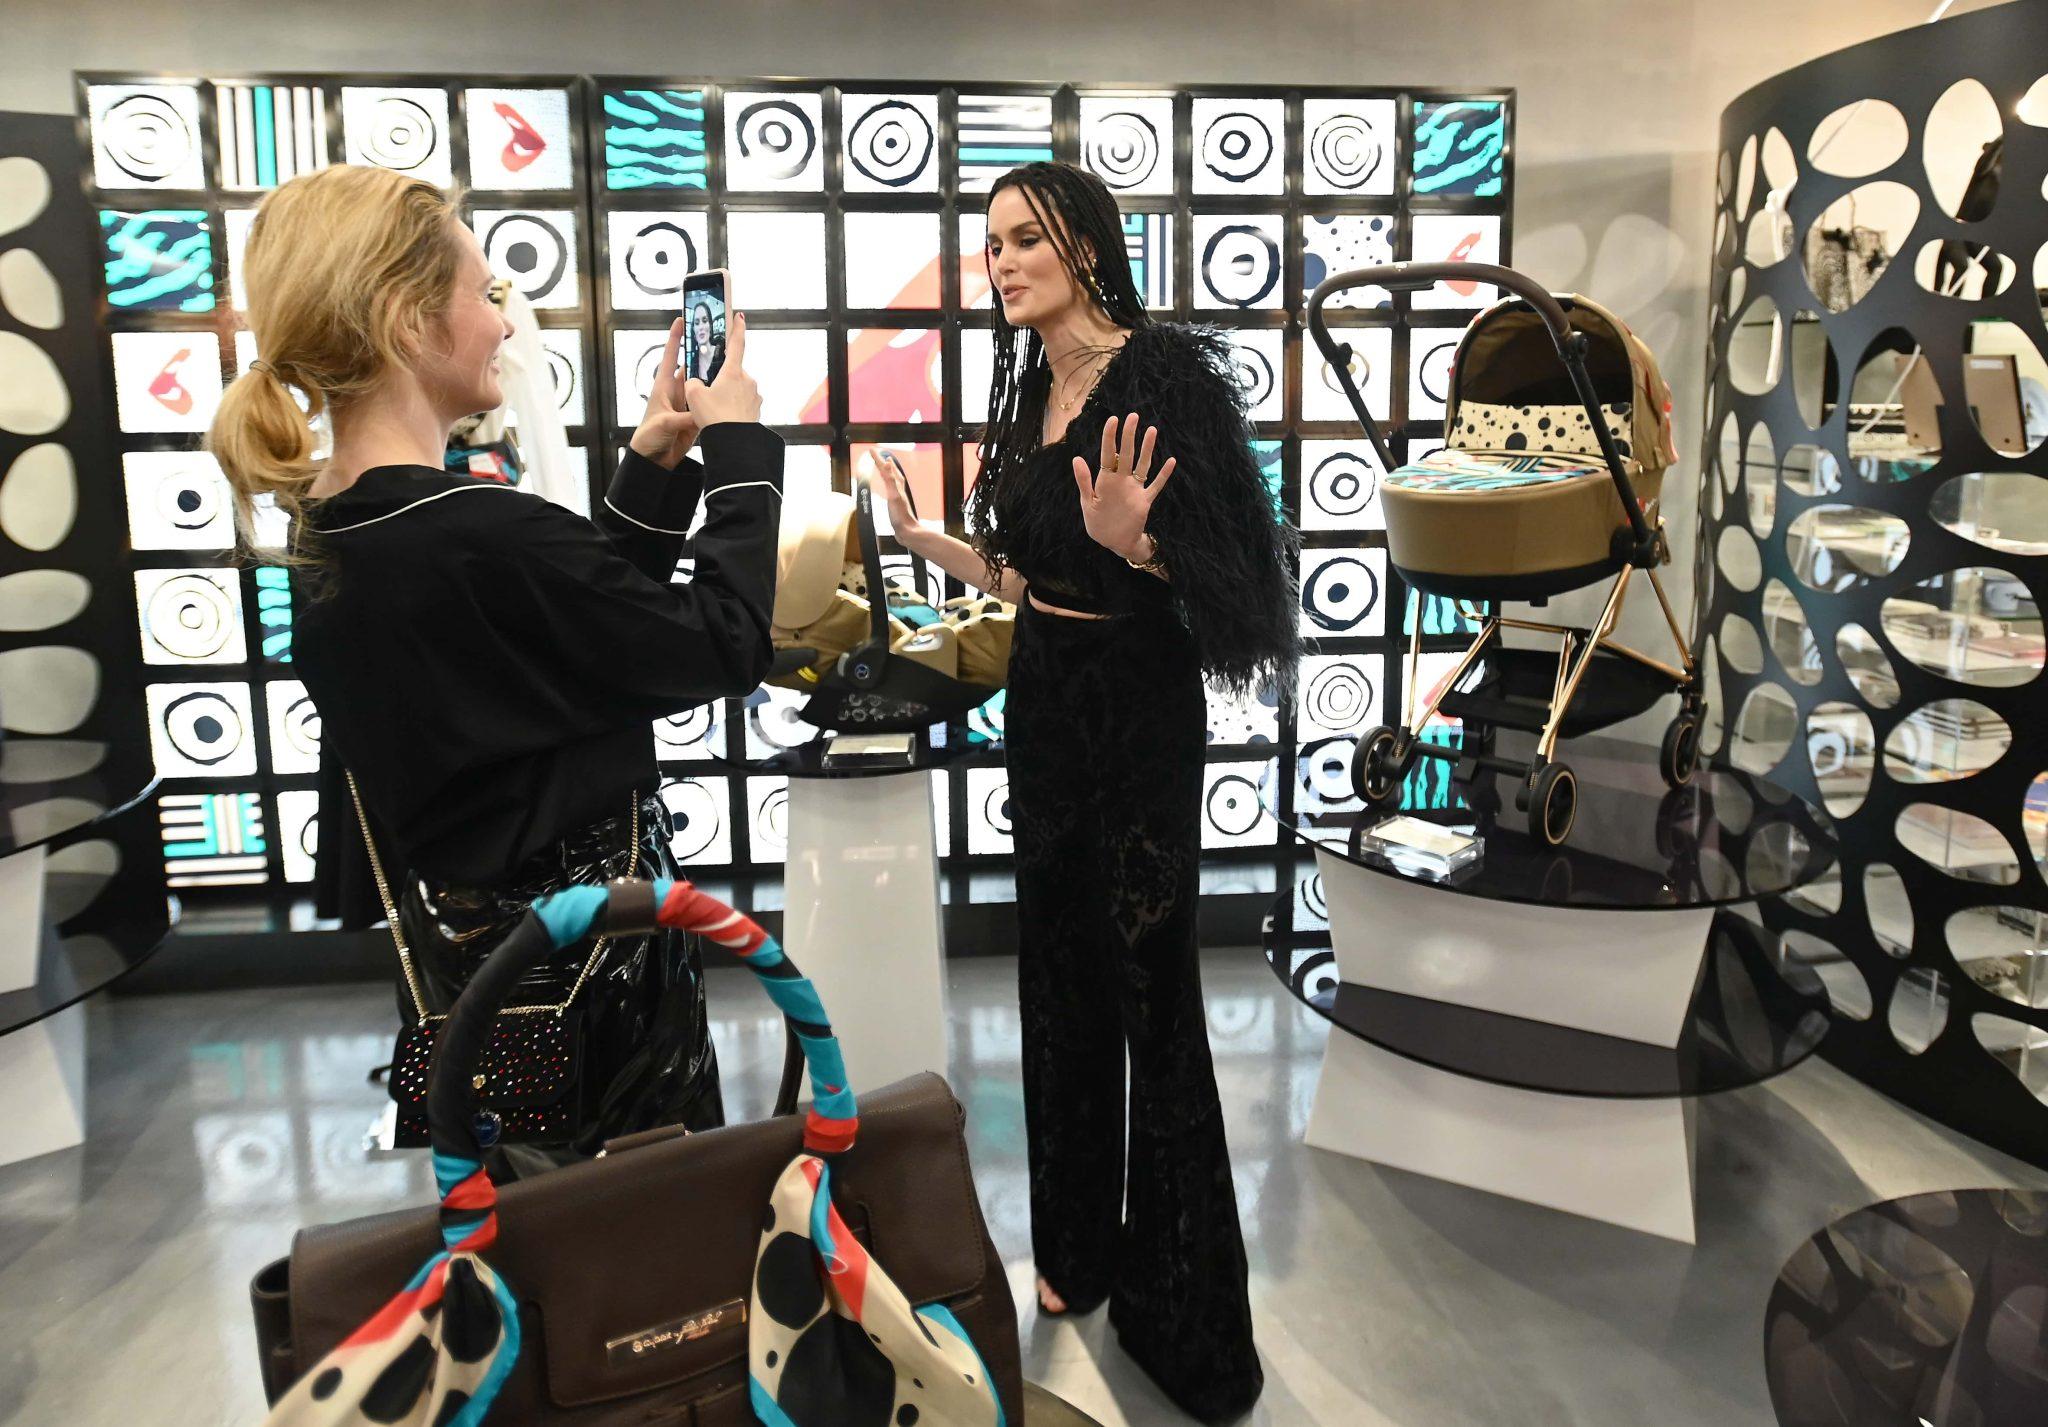 2801EF14-8320-4766-82E4-614AFCD0C7D5 CYBEX Launches Collaboration With Supermodel Karolina Kurkova